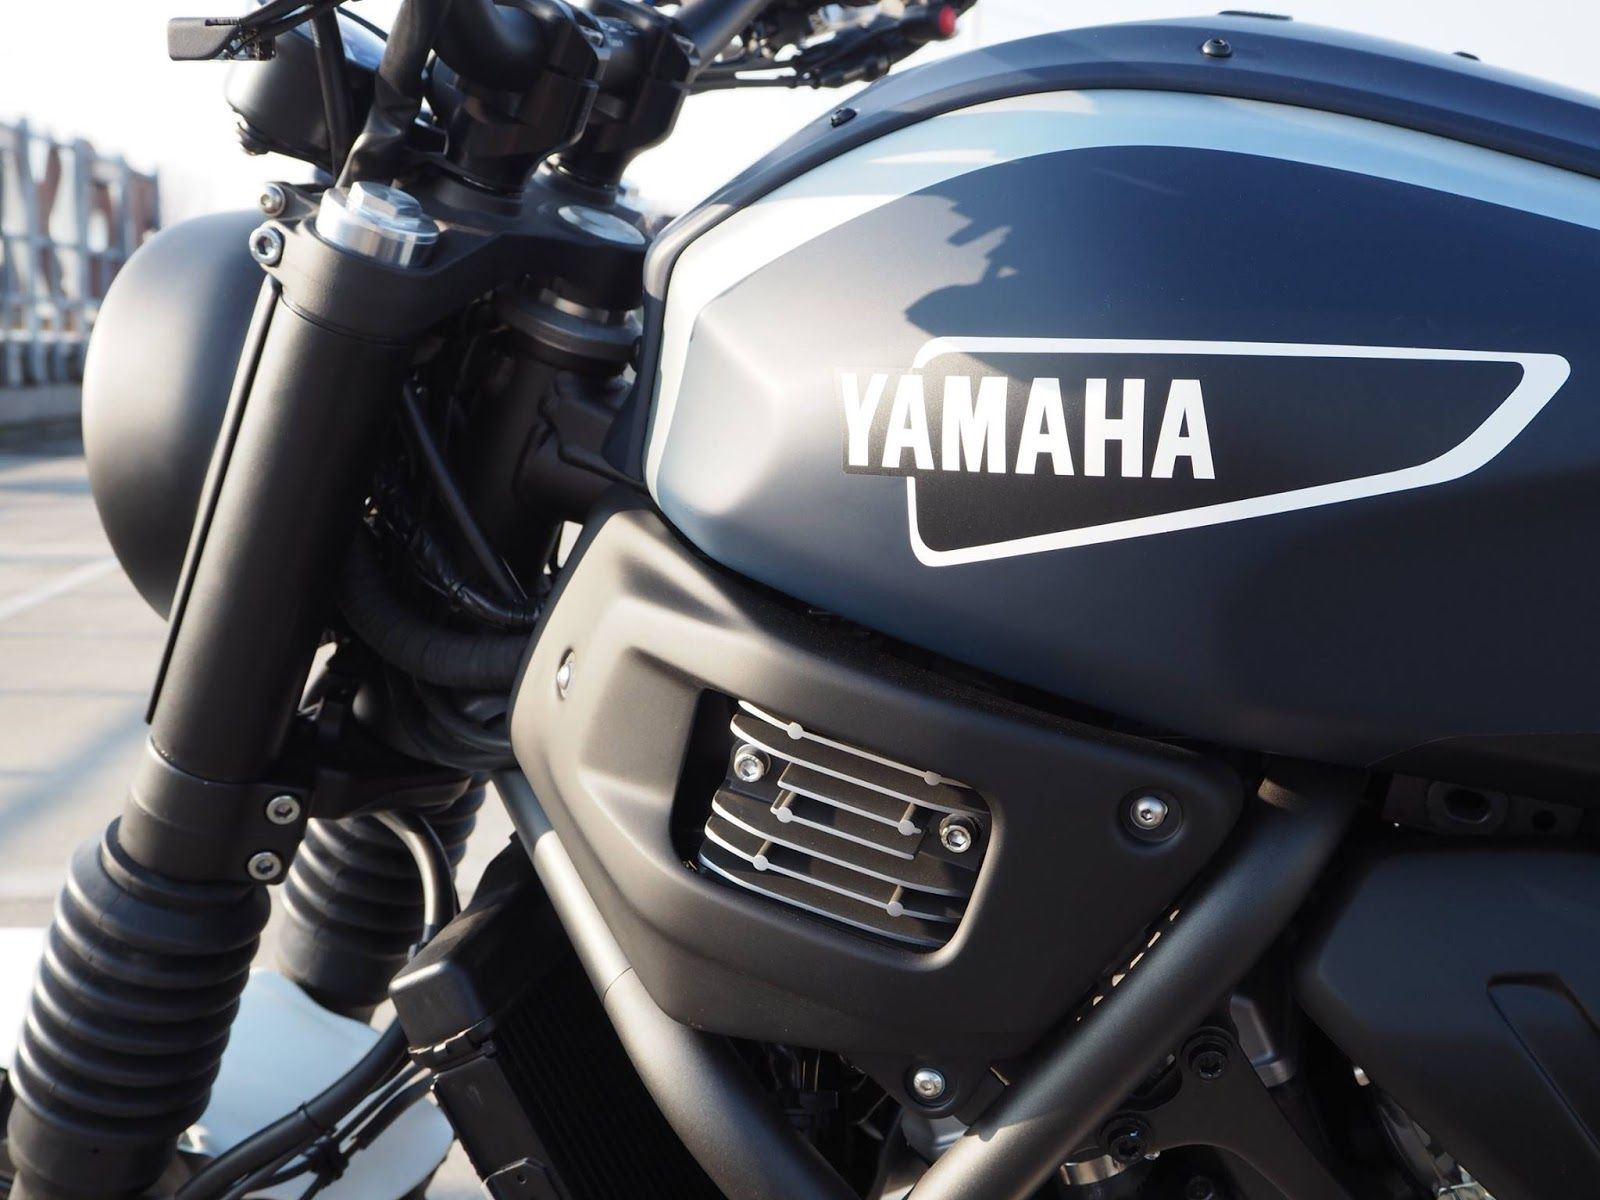 Yamaha XSR700 Super 7 Scrambler By JVB Moto